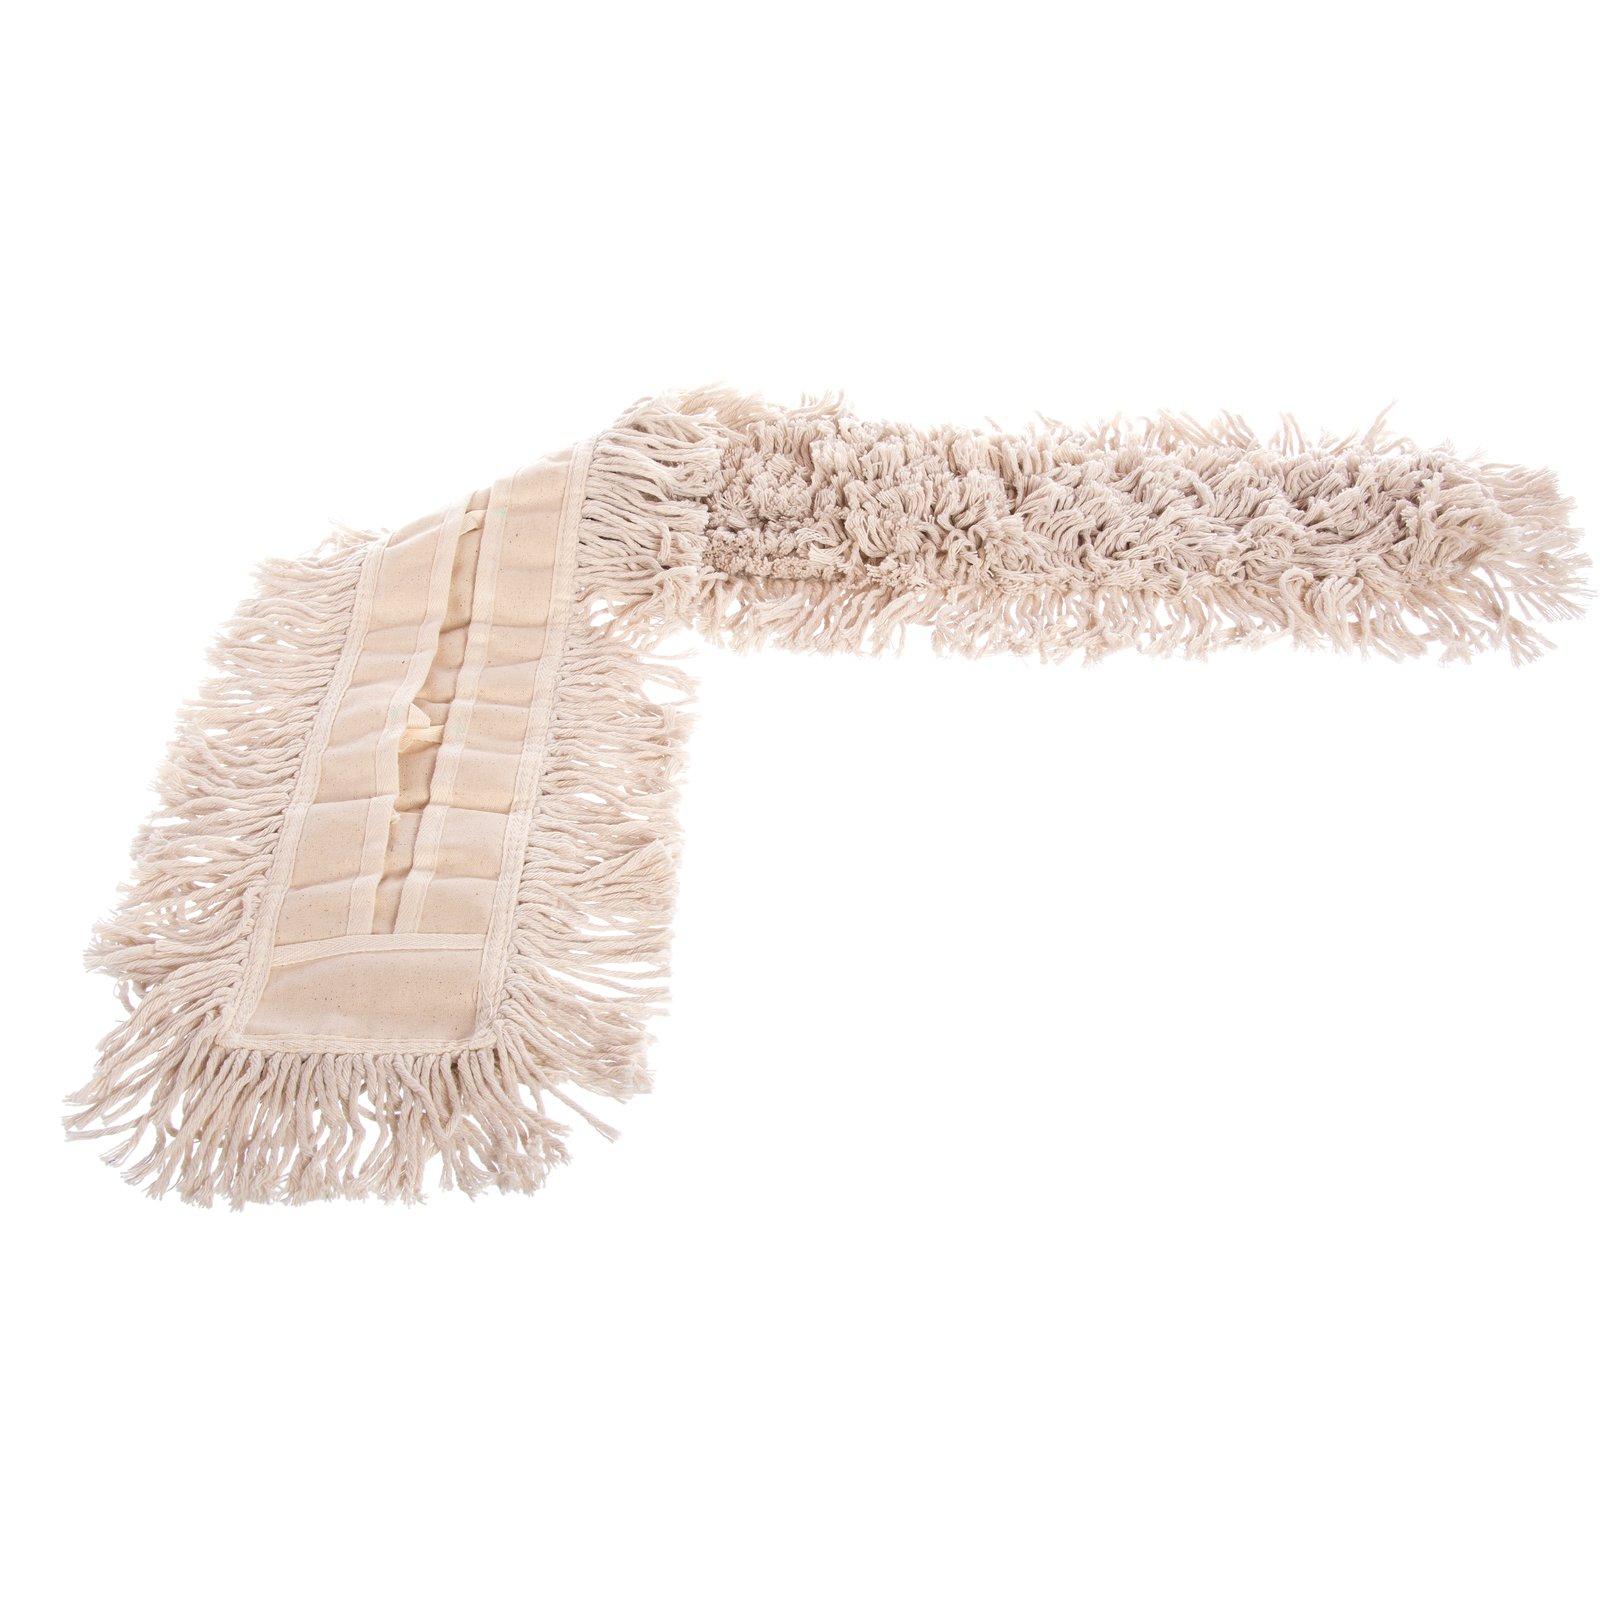 364733600 - Flo-Pac® Tie Back Dust Mop 36